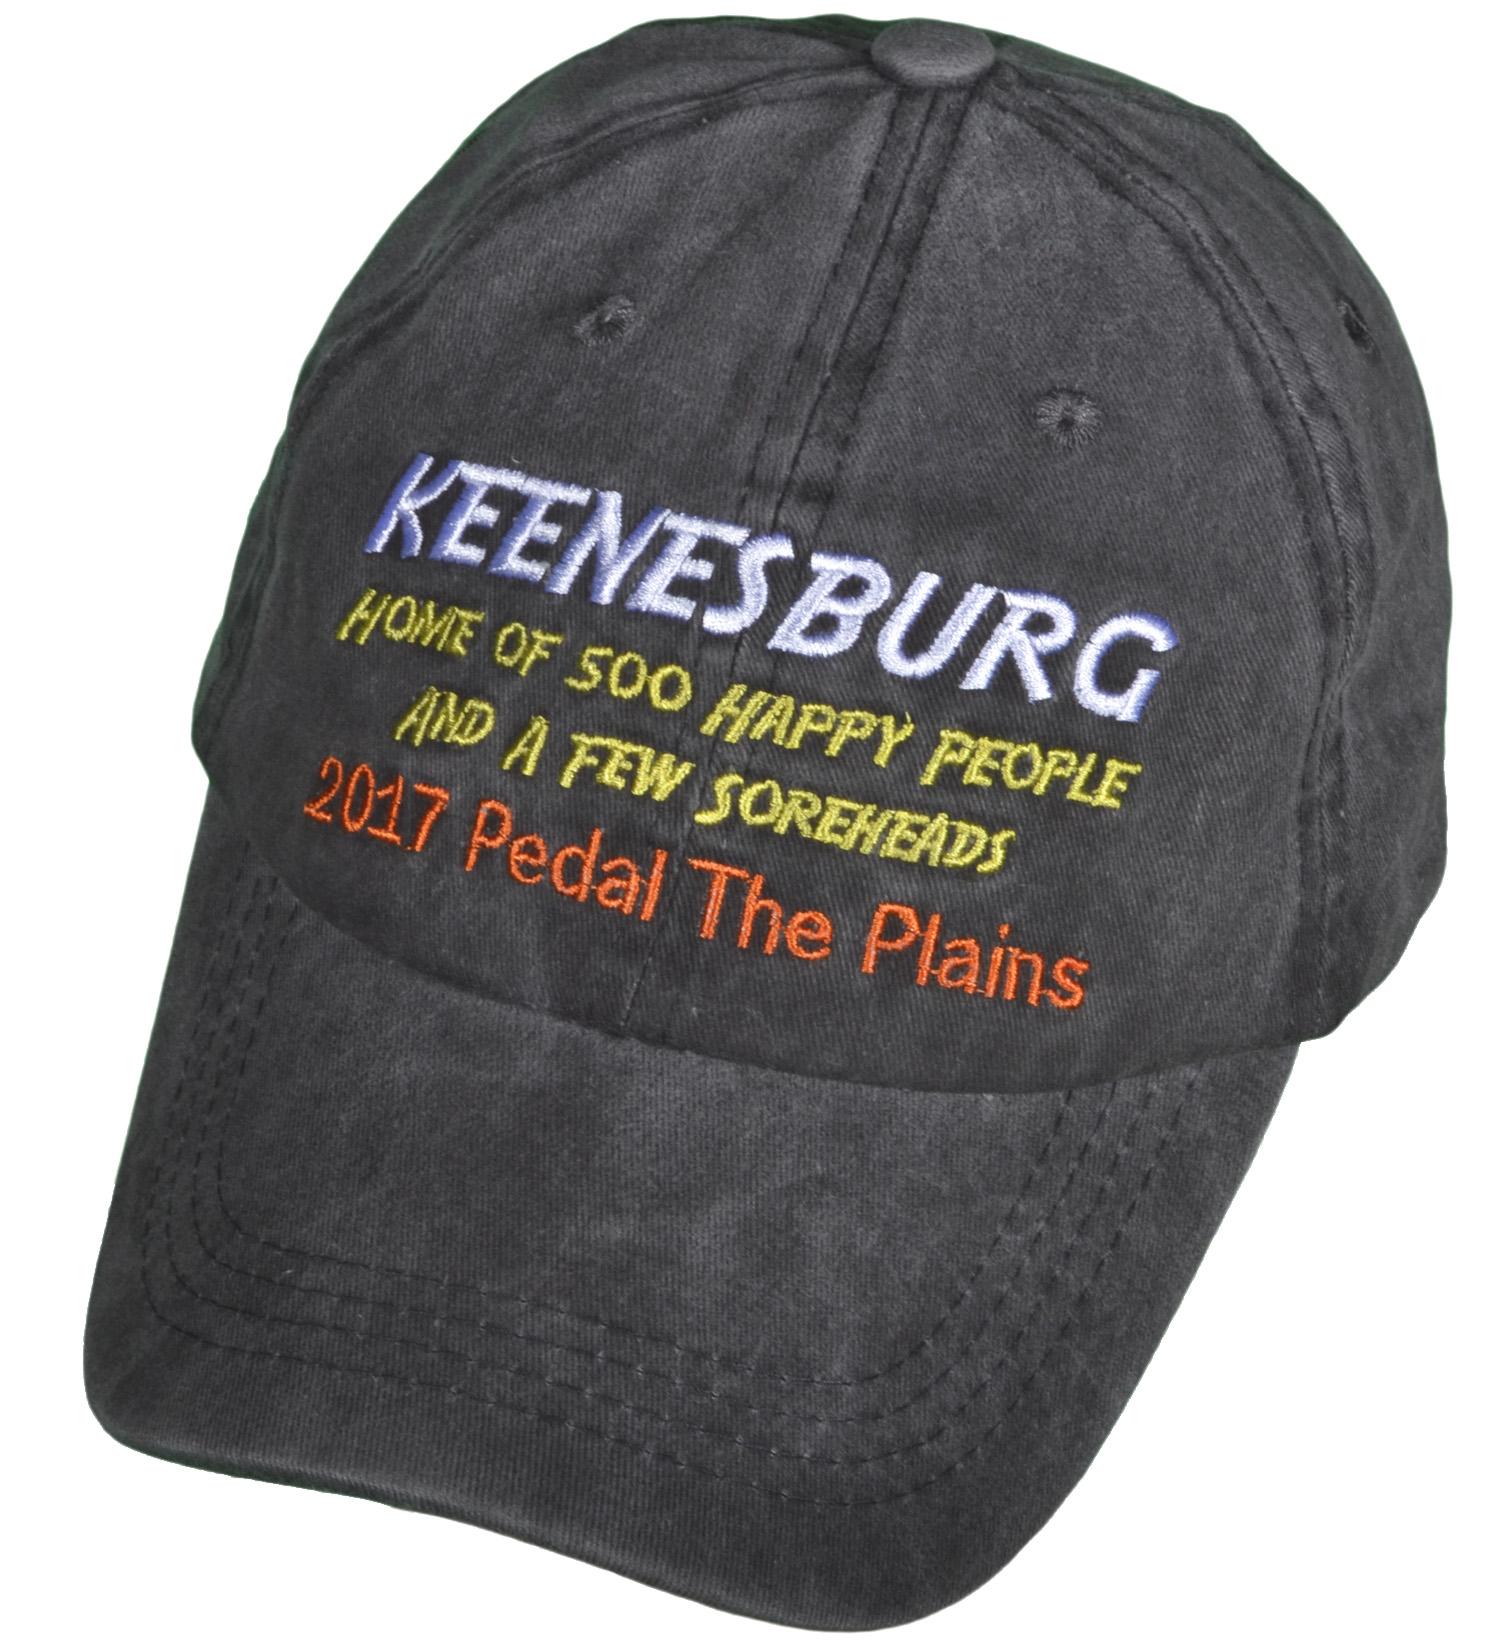 embrodered-dad-hat-custom-buckwholesale.jpg